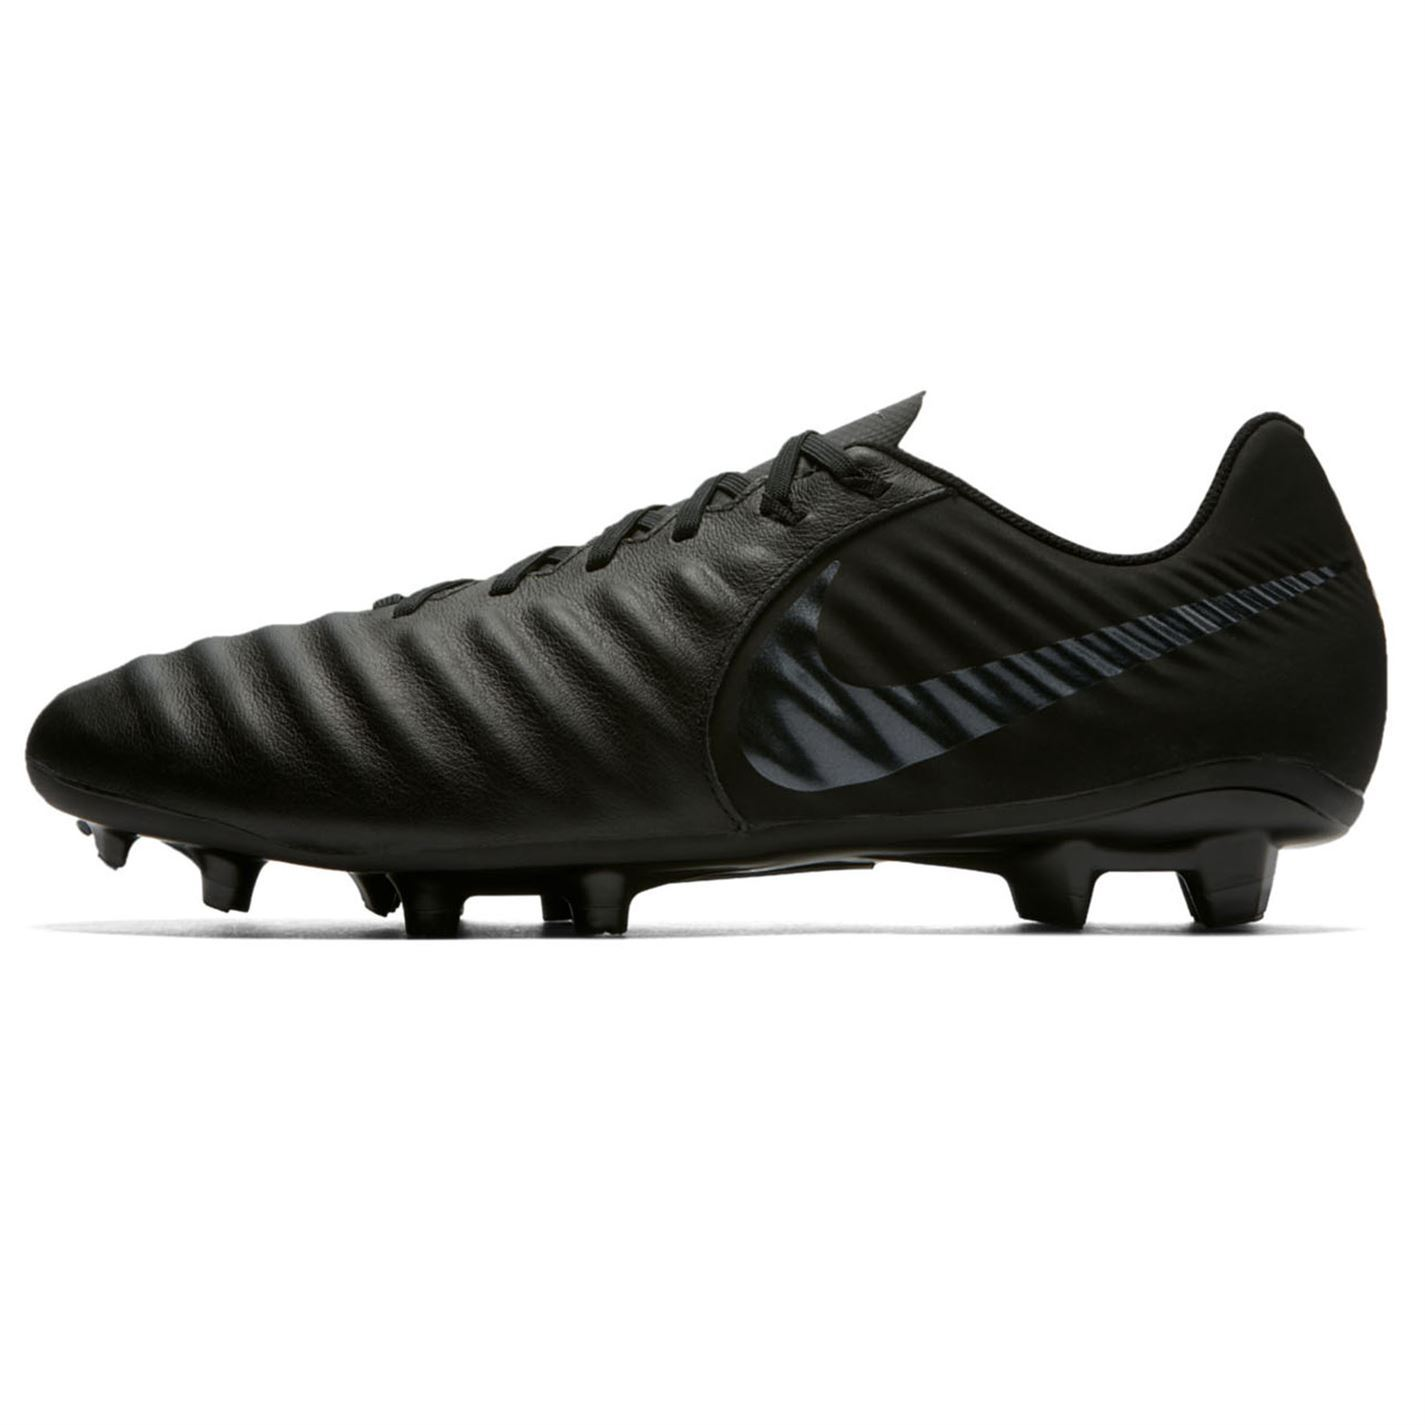 miniature 11 - Nike-Tiempo-Legend-Academy-FG-Firm-Ground-Chaussures-De-Football-Homme-Football-Chaussures-Crampons